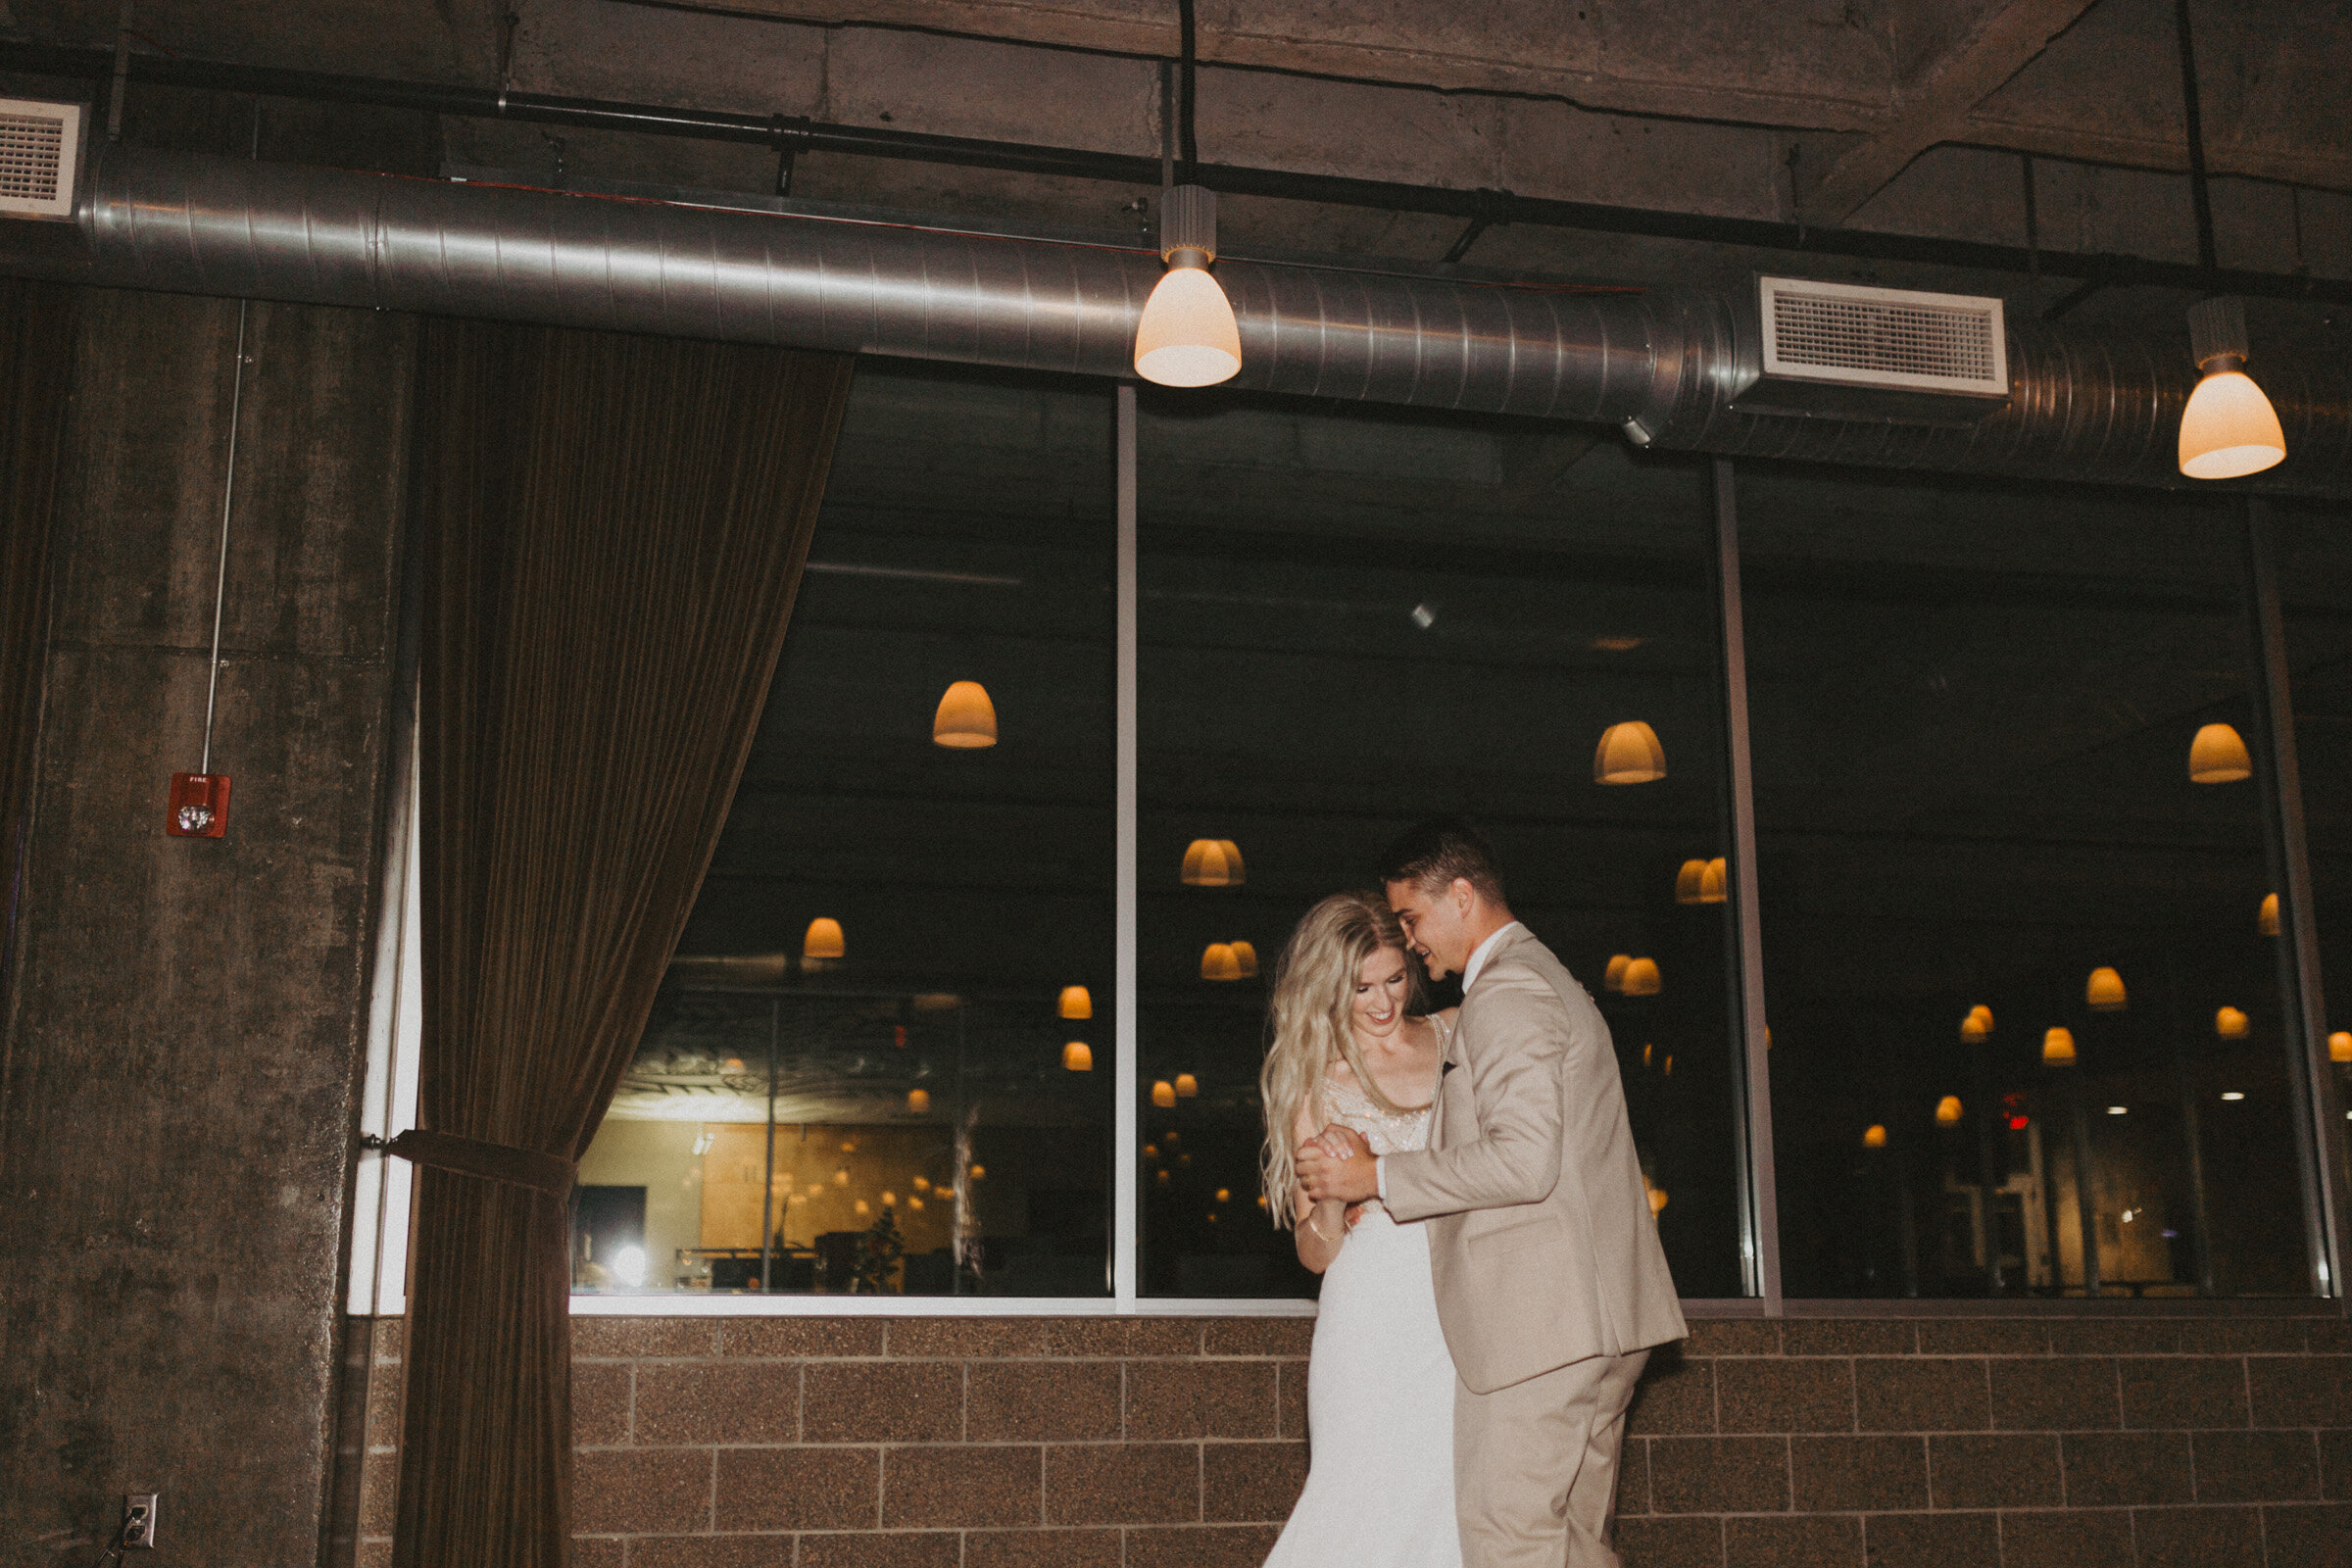 alyssa barletter photography downtown kansas city wedding boulevard brewery reception rainy day wedding-61.jpg